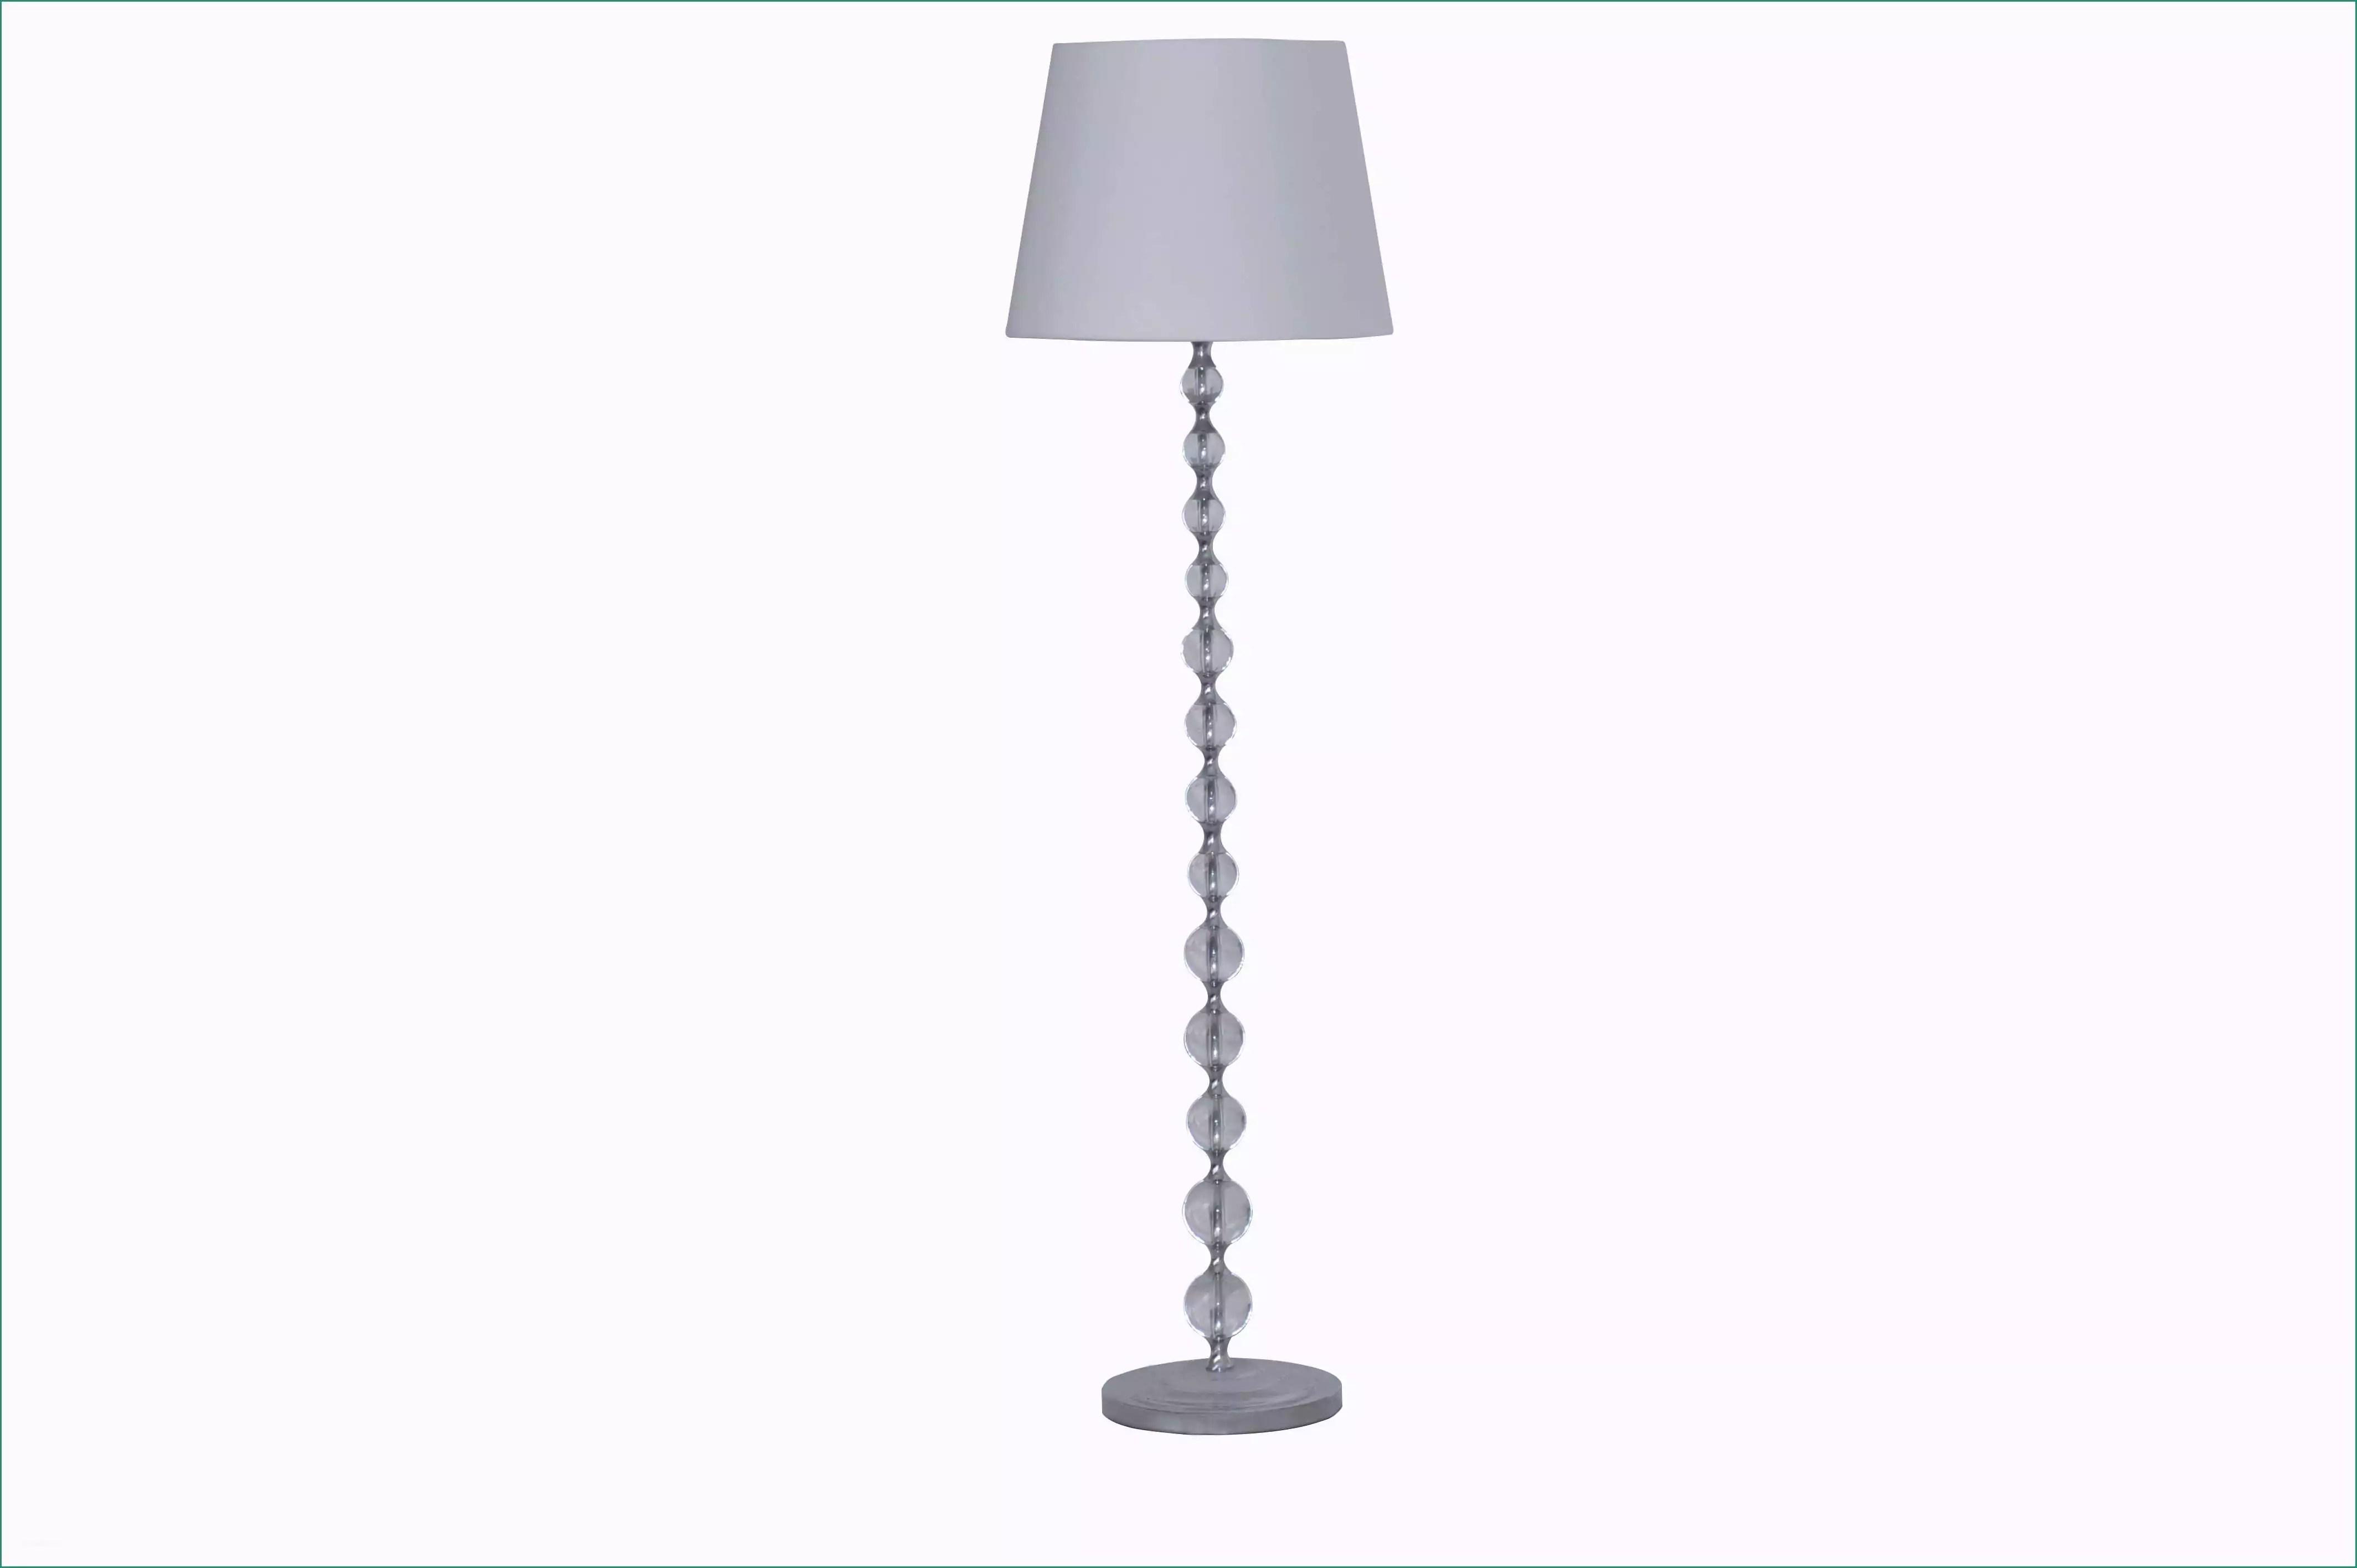 Lampade Artemide Prezzi - Idee di colori per interni di ...